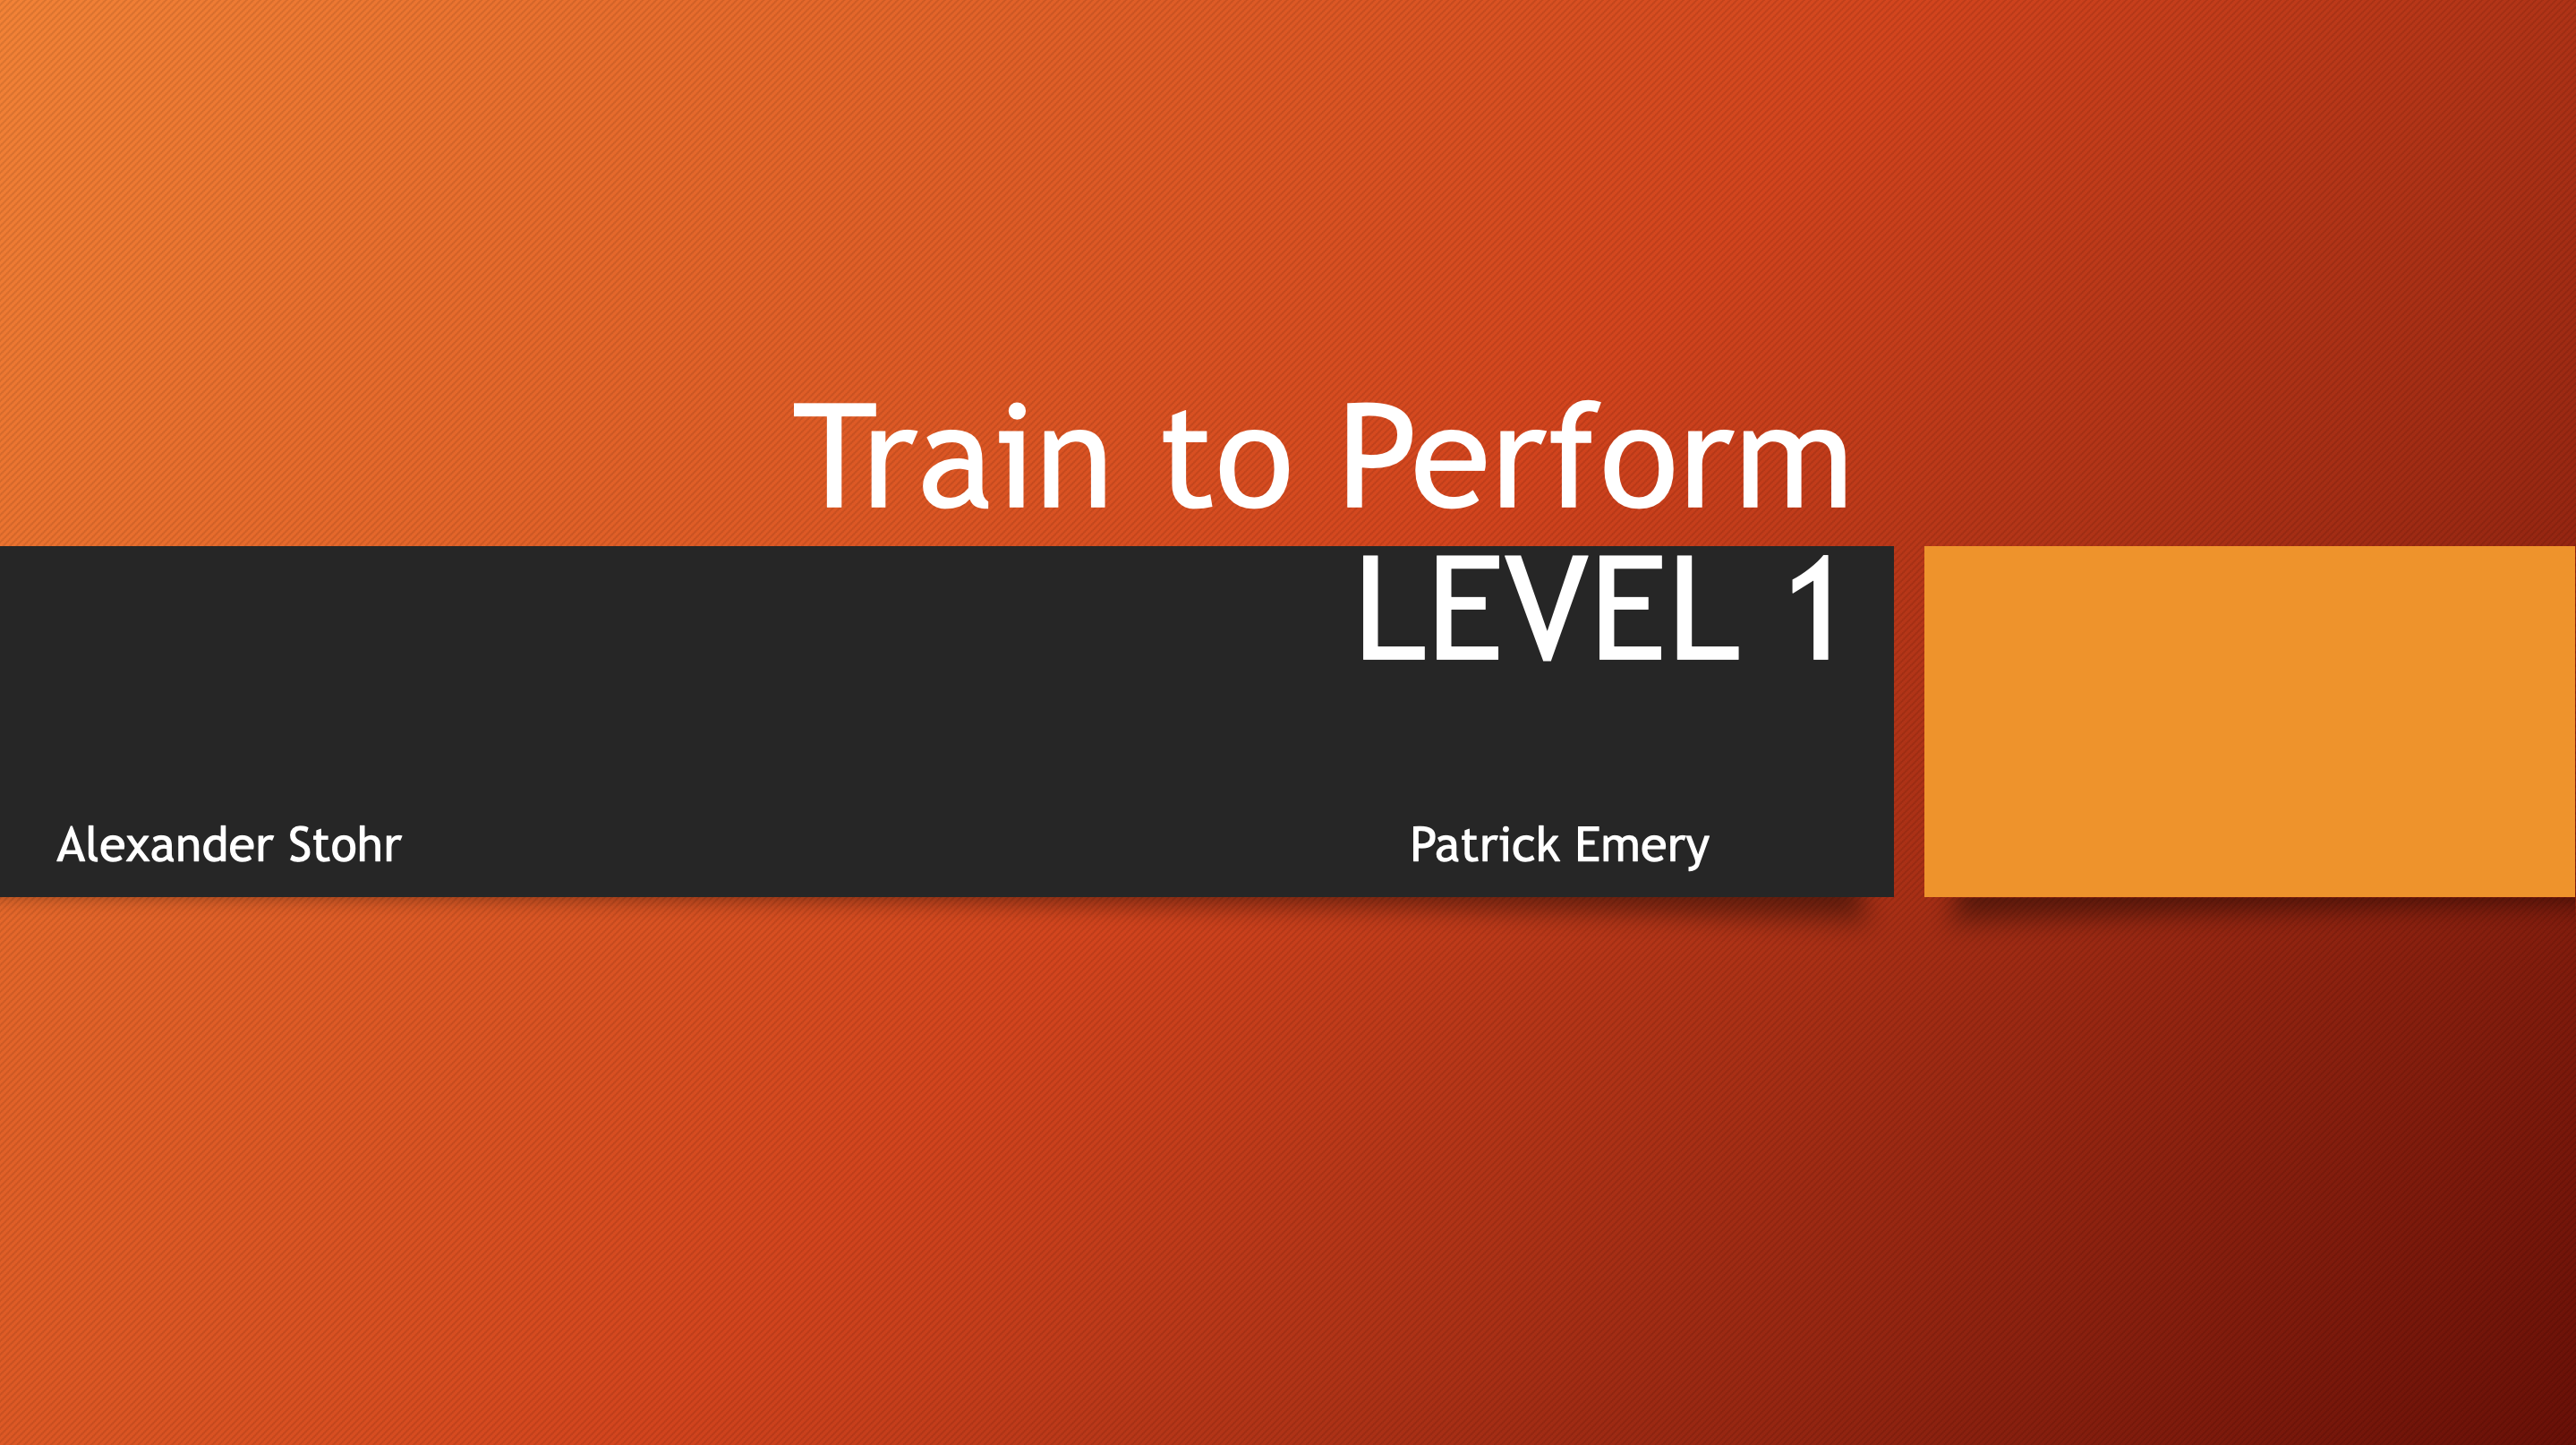 Train To Perform Level 1 Webinar